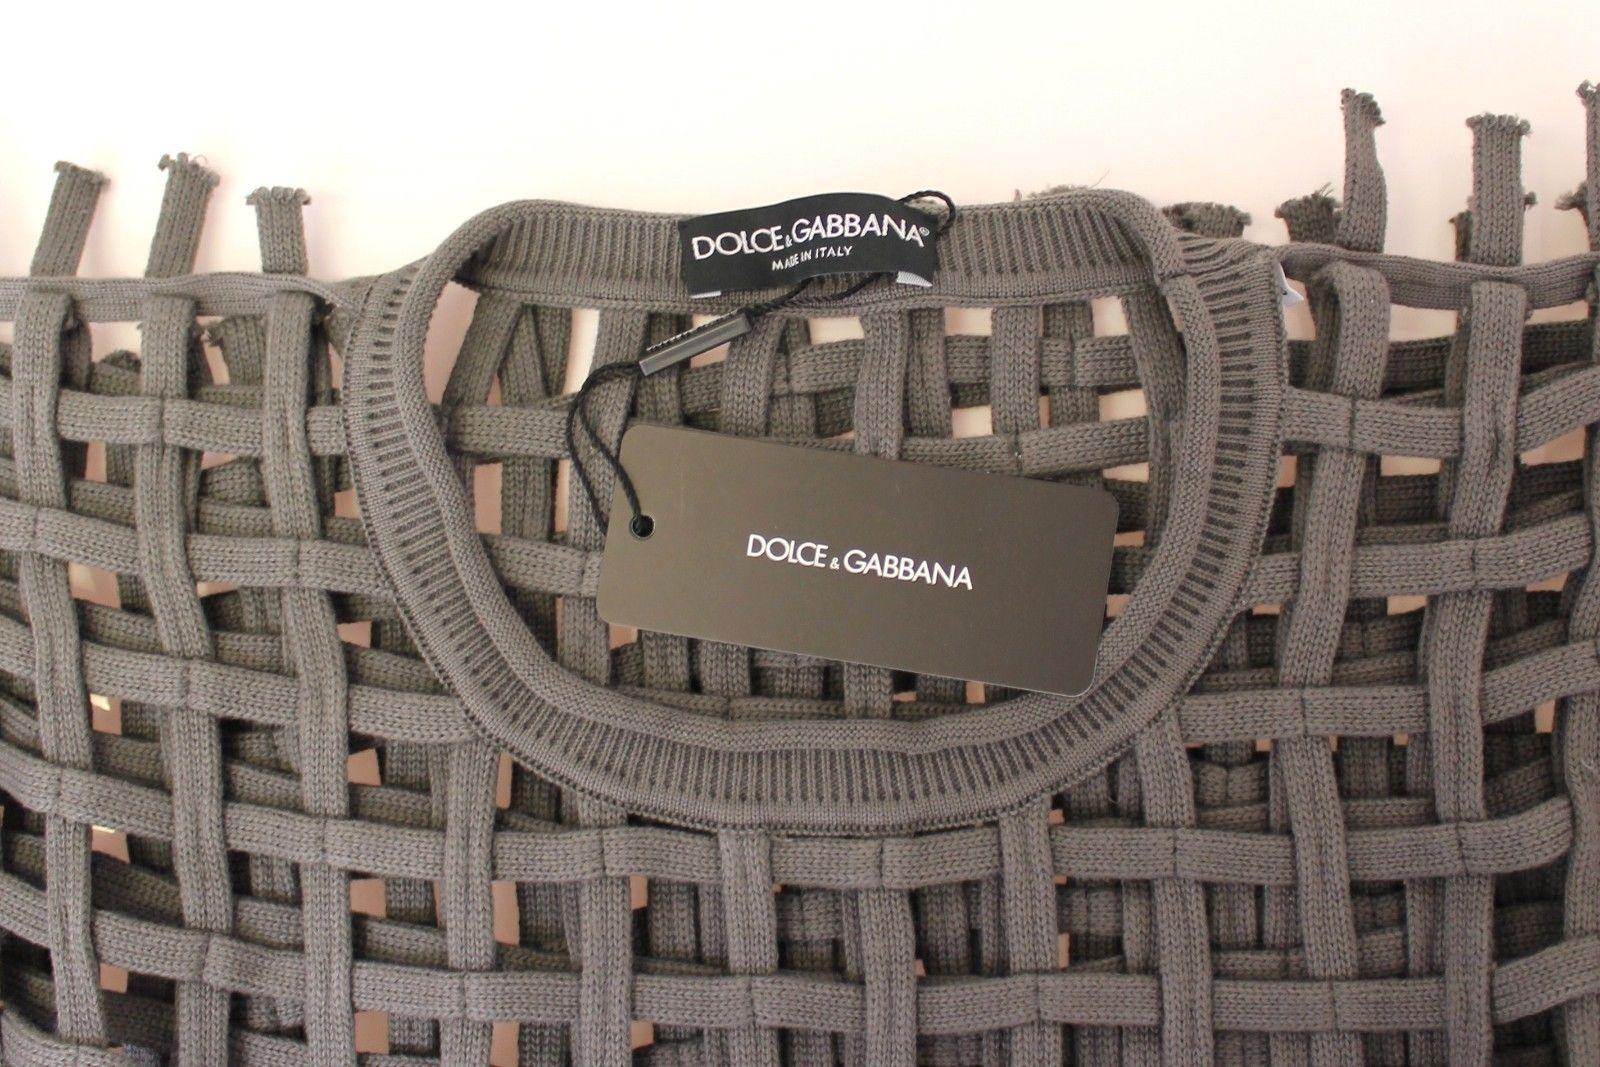 Dolce & Gabbana Gray Runway Catwalk Nets Knitted Sweater